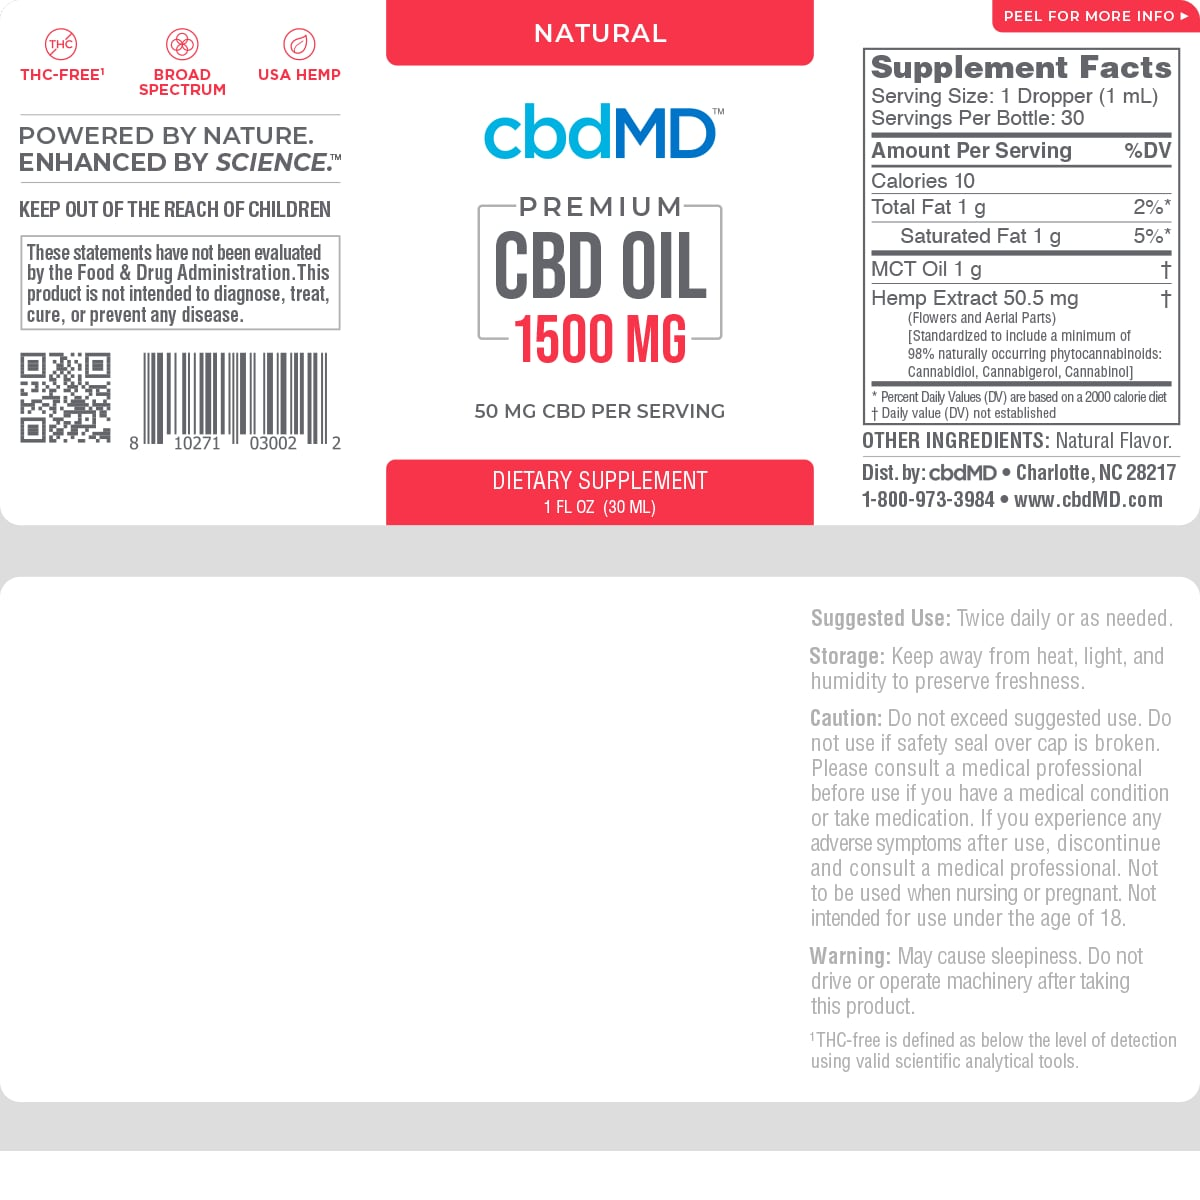 cbdMD, CBD Oil Tincture, Broad Spectrum THC-Free, Natural Flavor, 1oz, 1500mg of CBD2